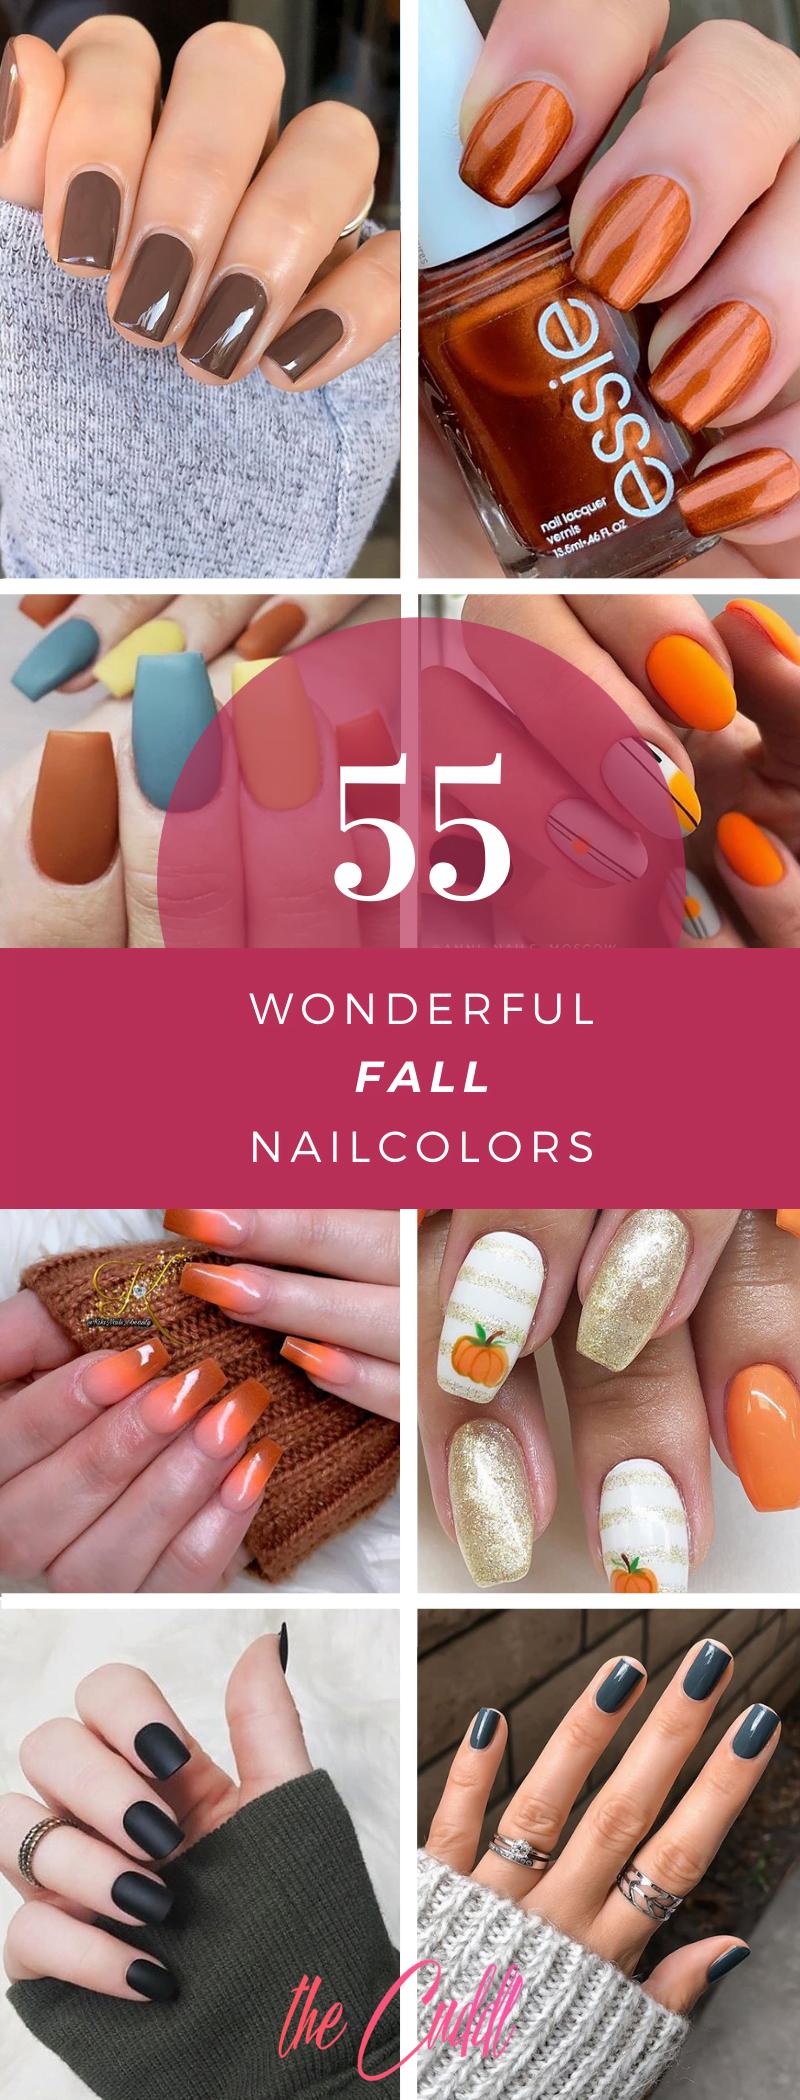 Top 50 Most Popular Fall Nail Designs